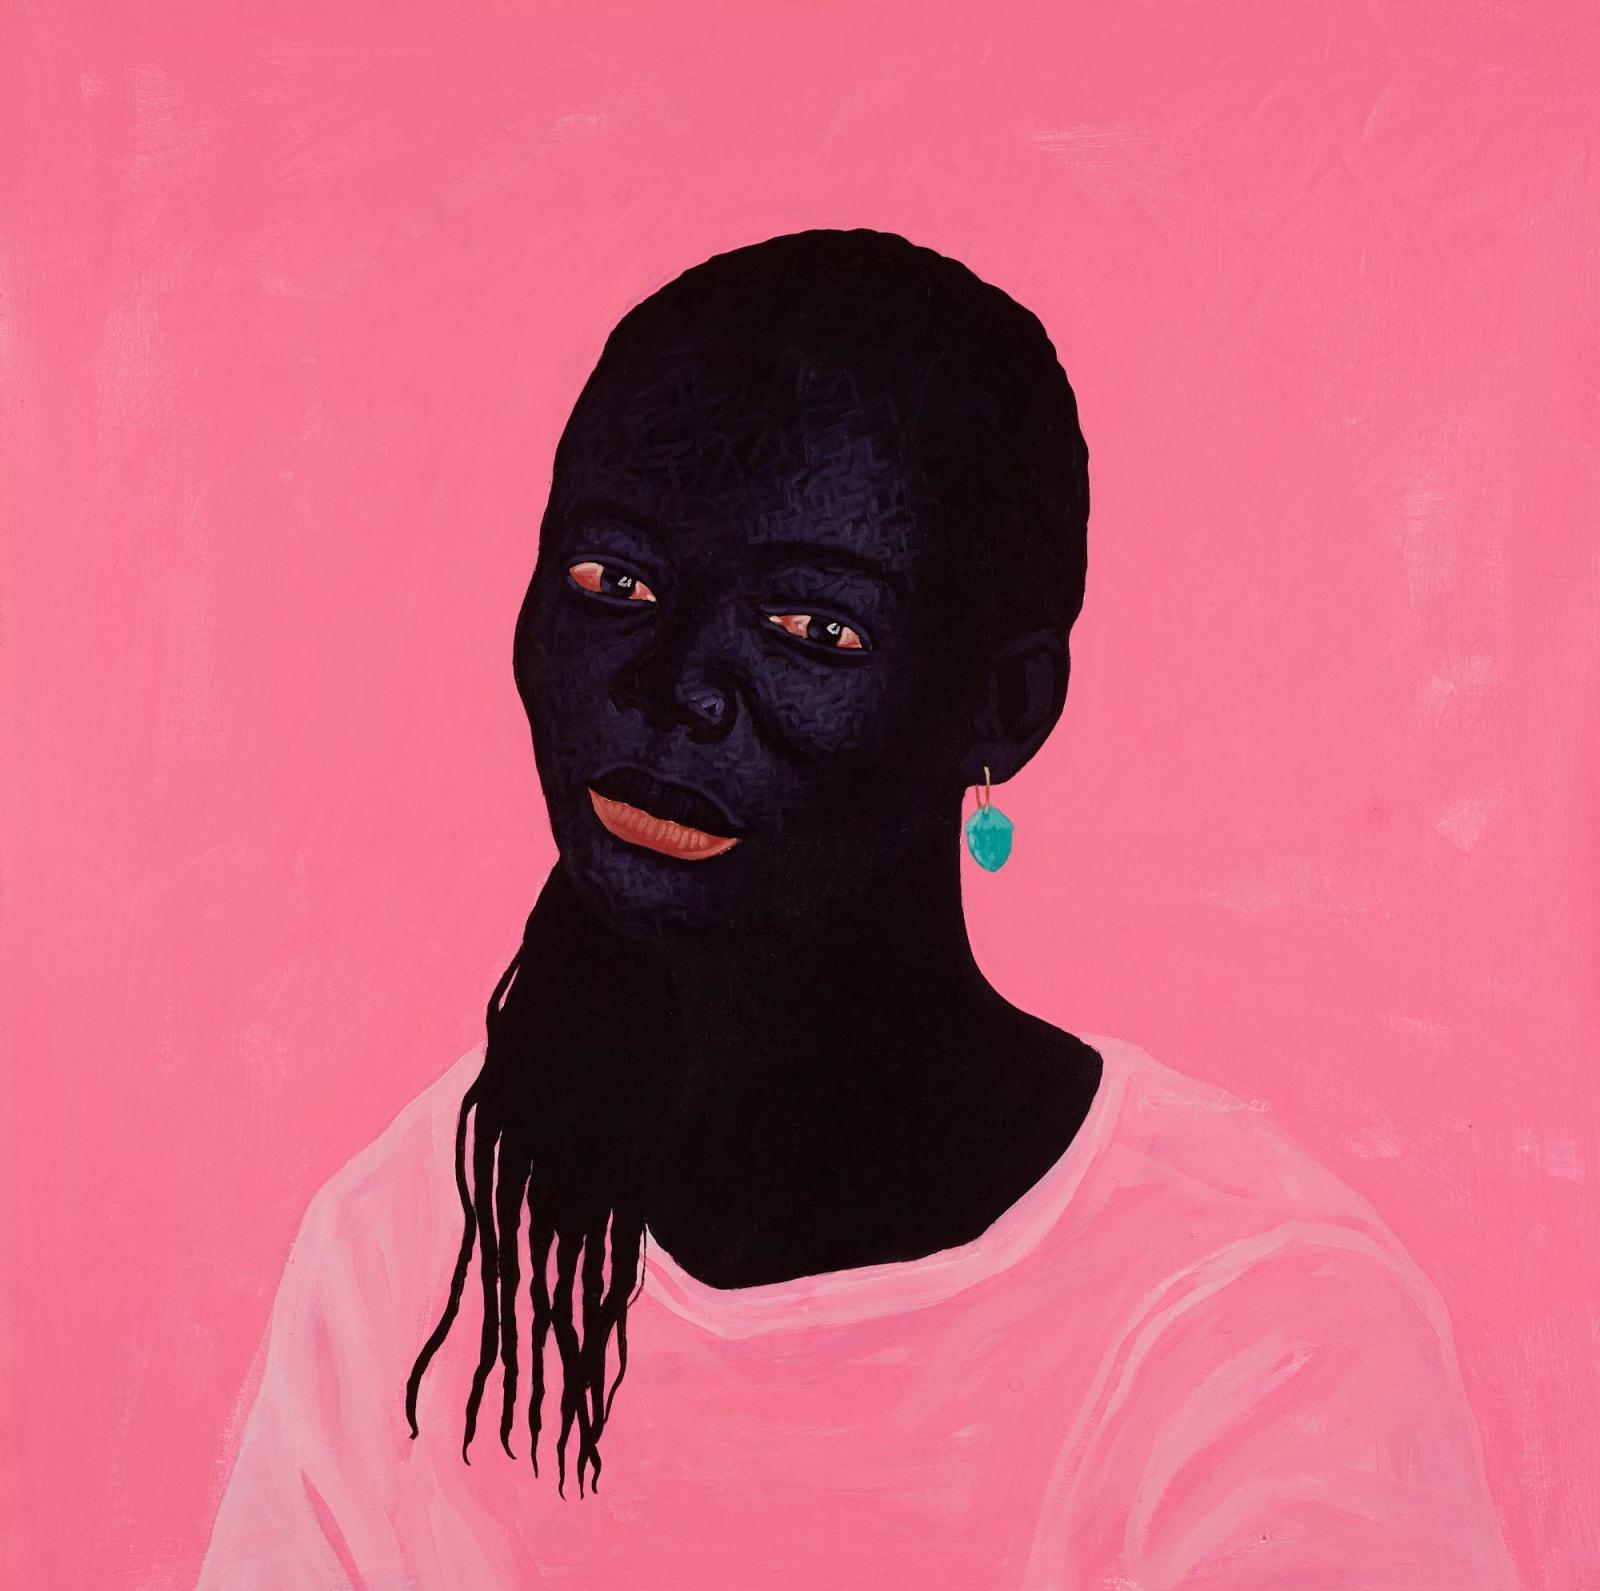 Kwesi Botchway, Turquoise Earring, 2020